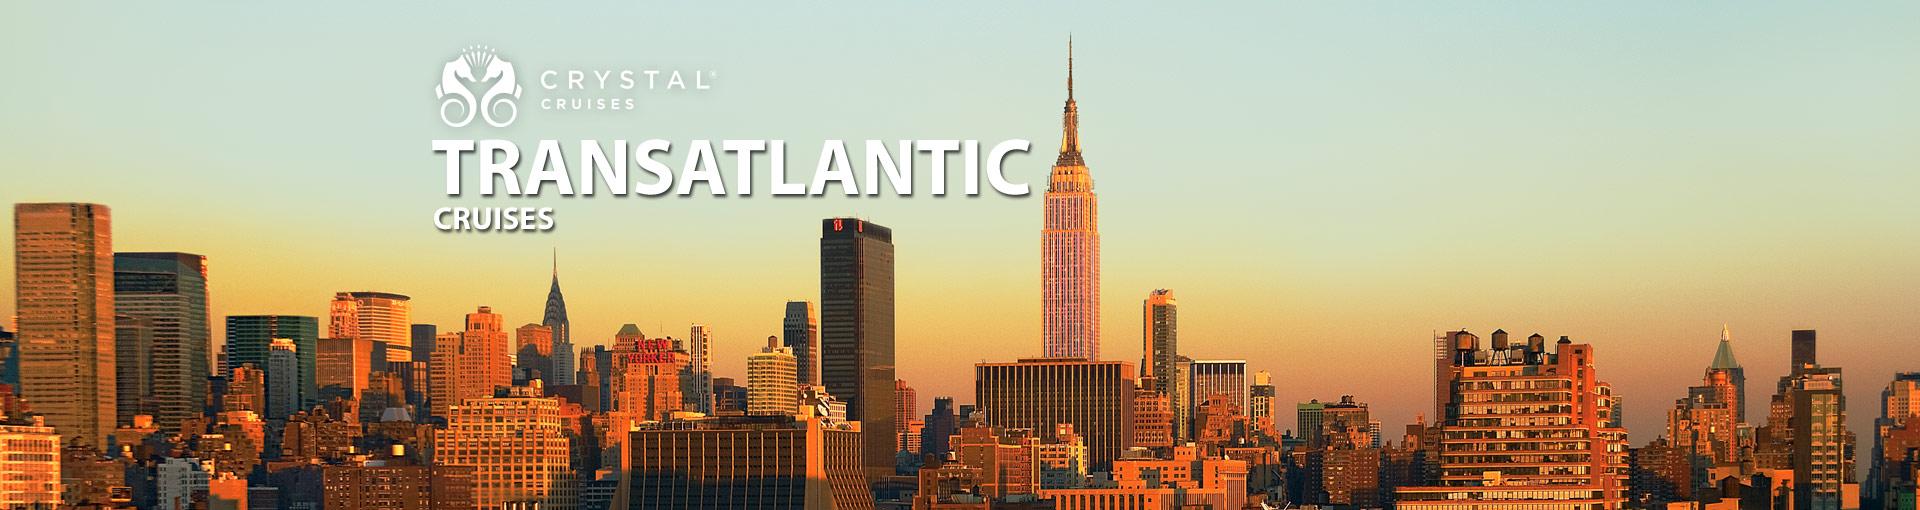 Crystal Cruises Transatlantic Cruises